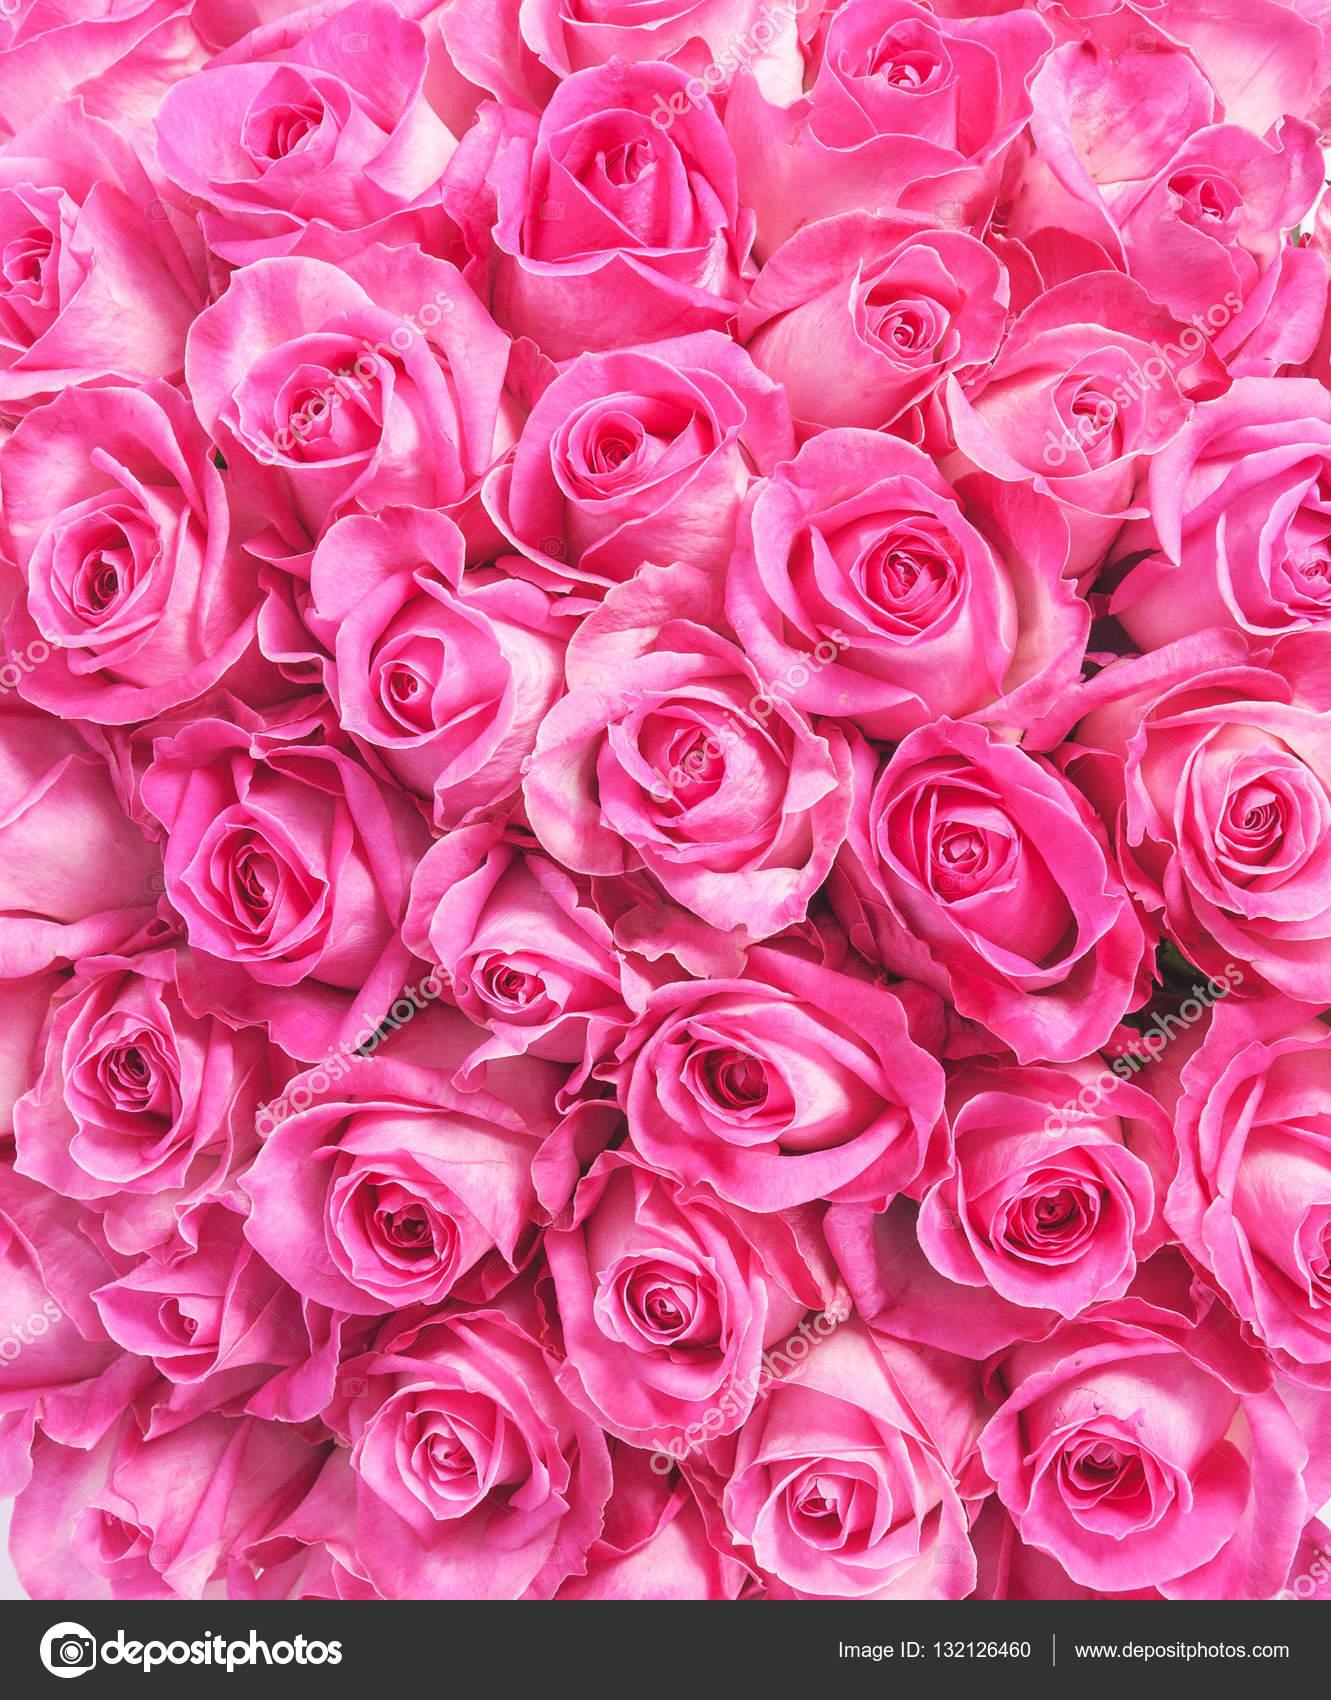 imagen de fondo de rosas rosadas fotos de stock gilmanshin